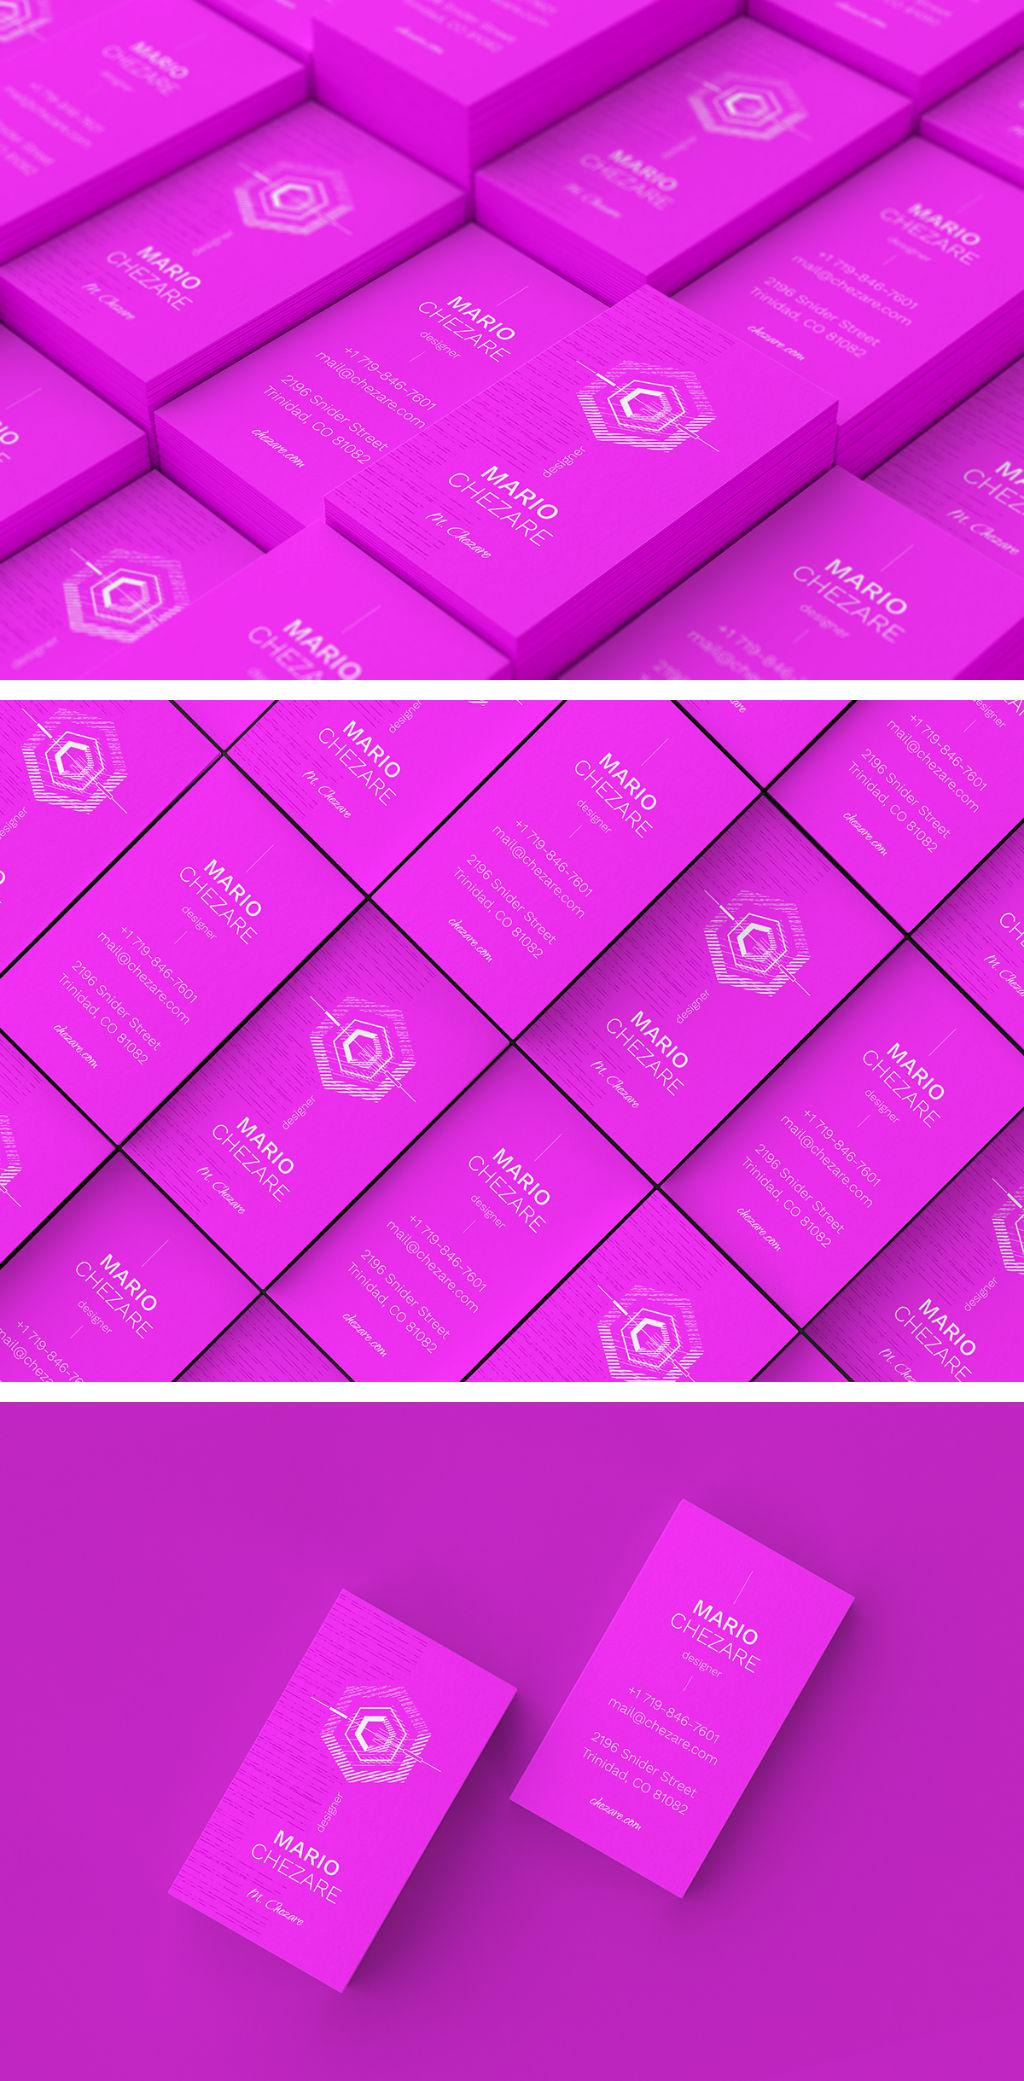 Chezare 3 - Business Card Template